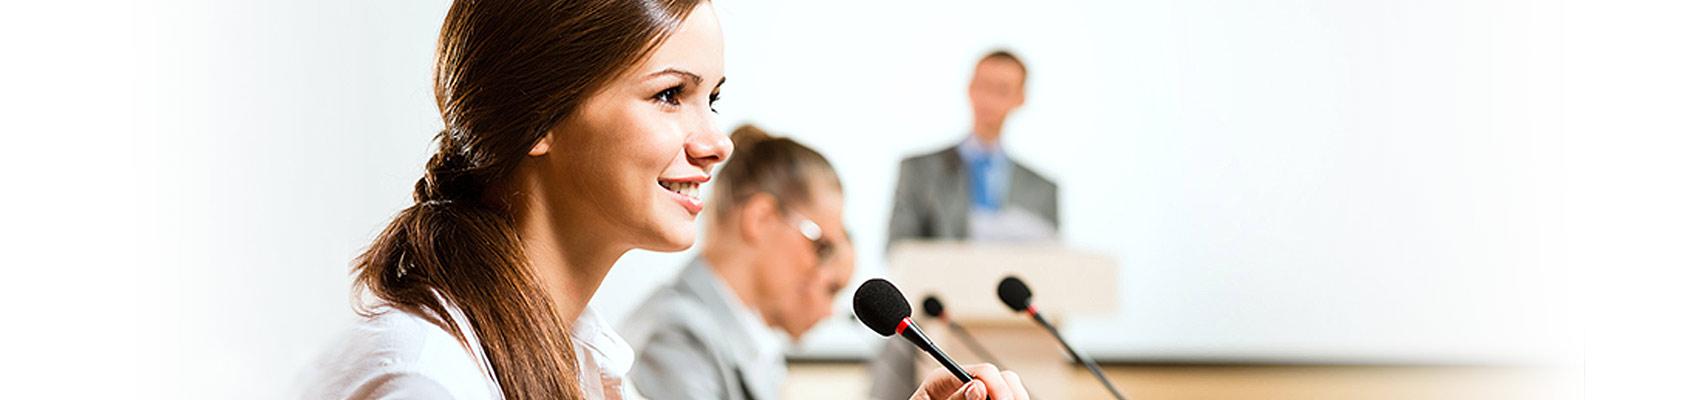 speech-academy-afbeelding-vrouw1700x4001